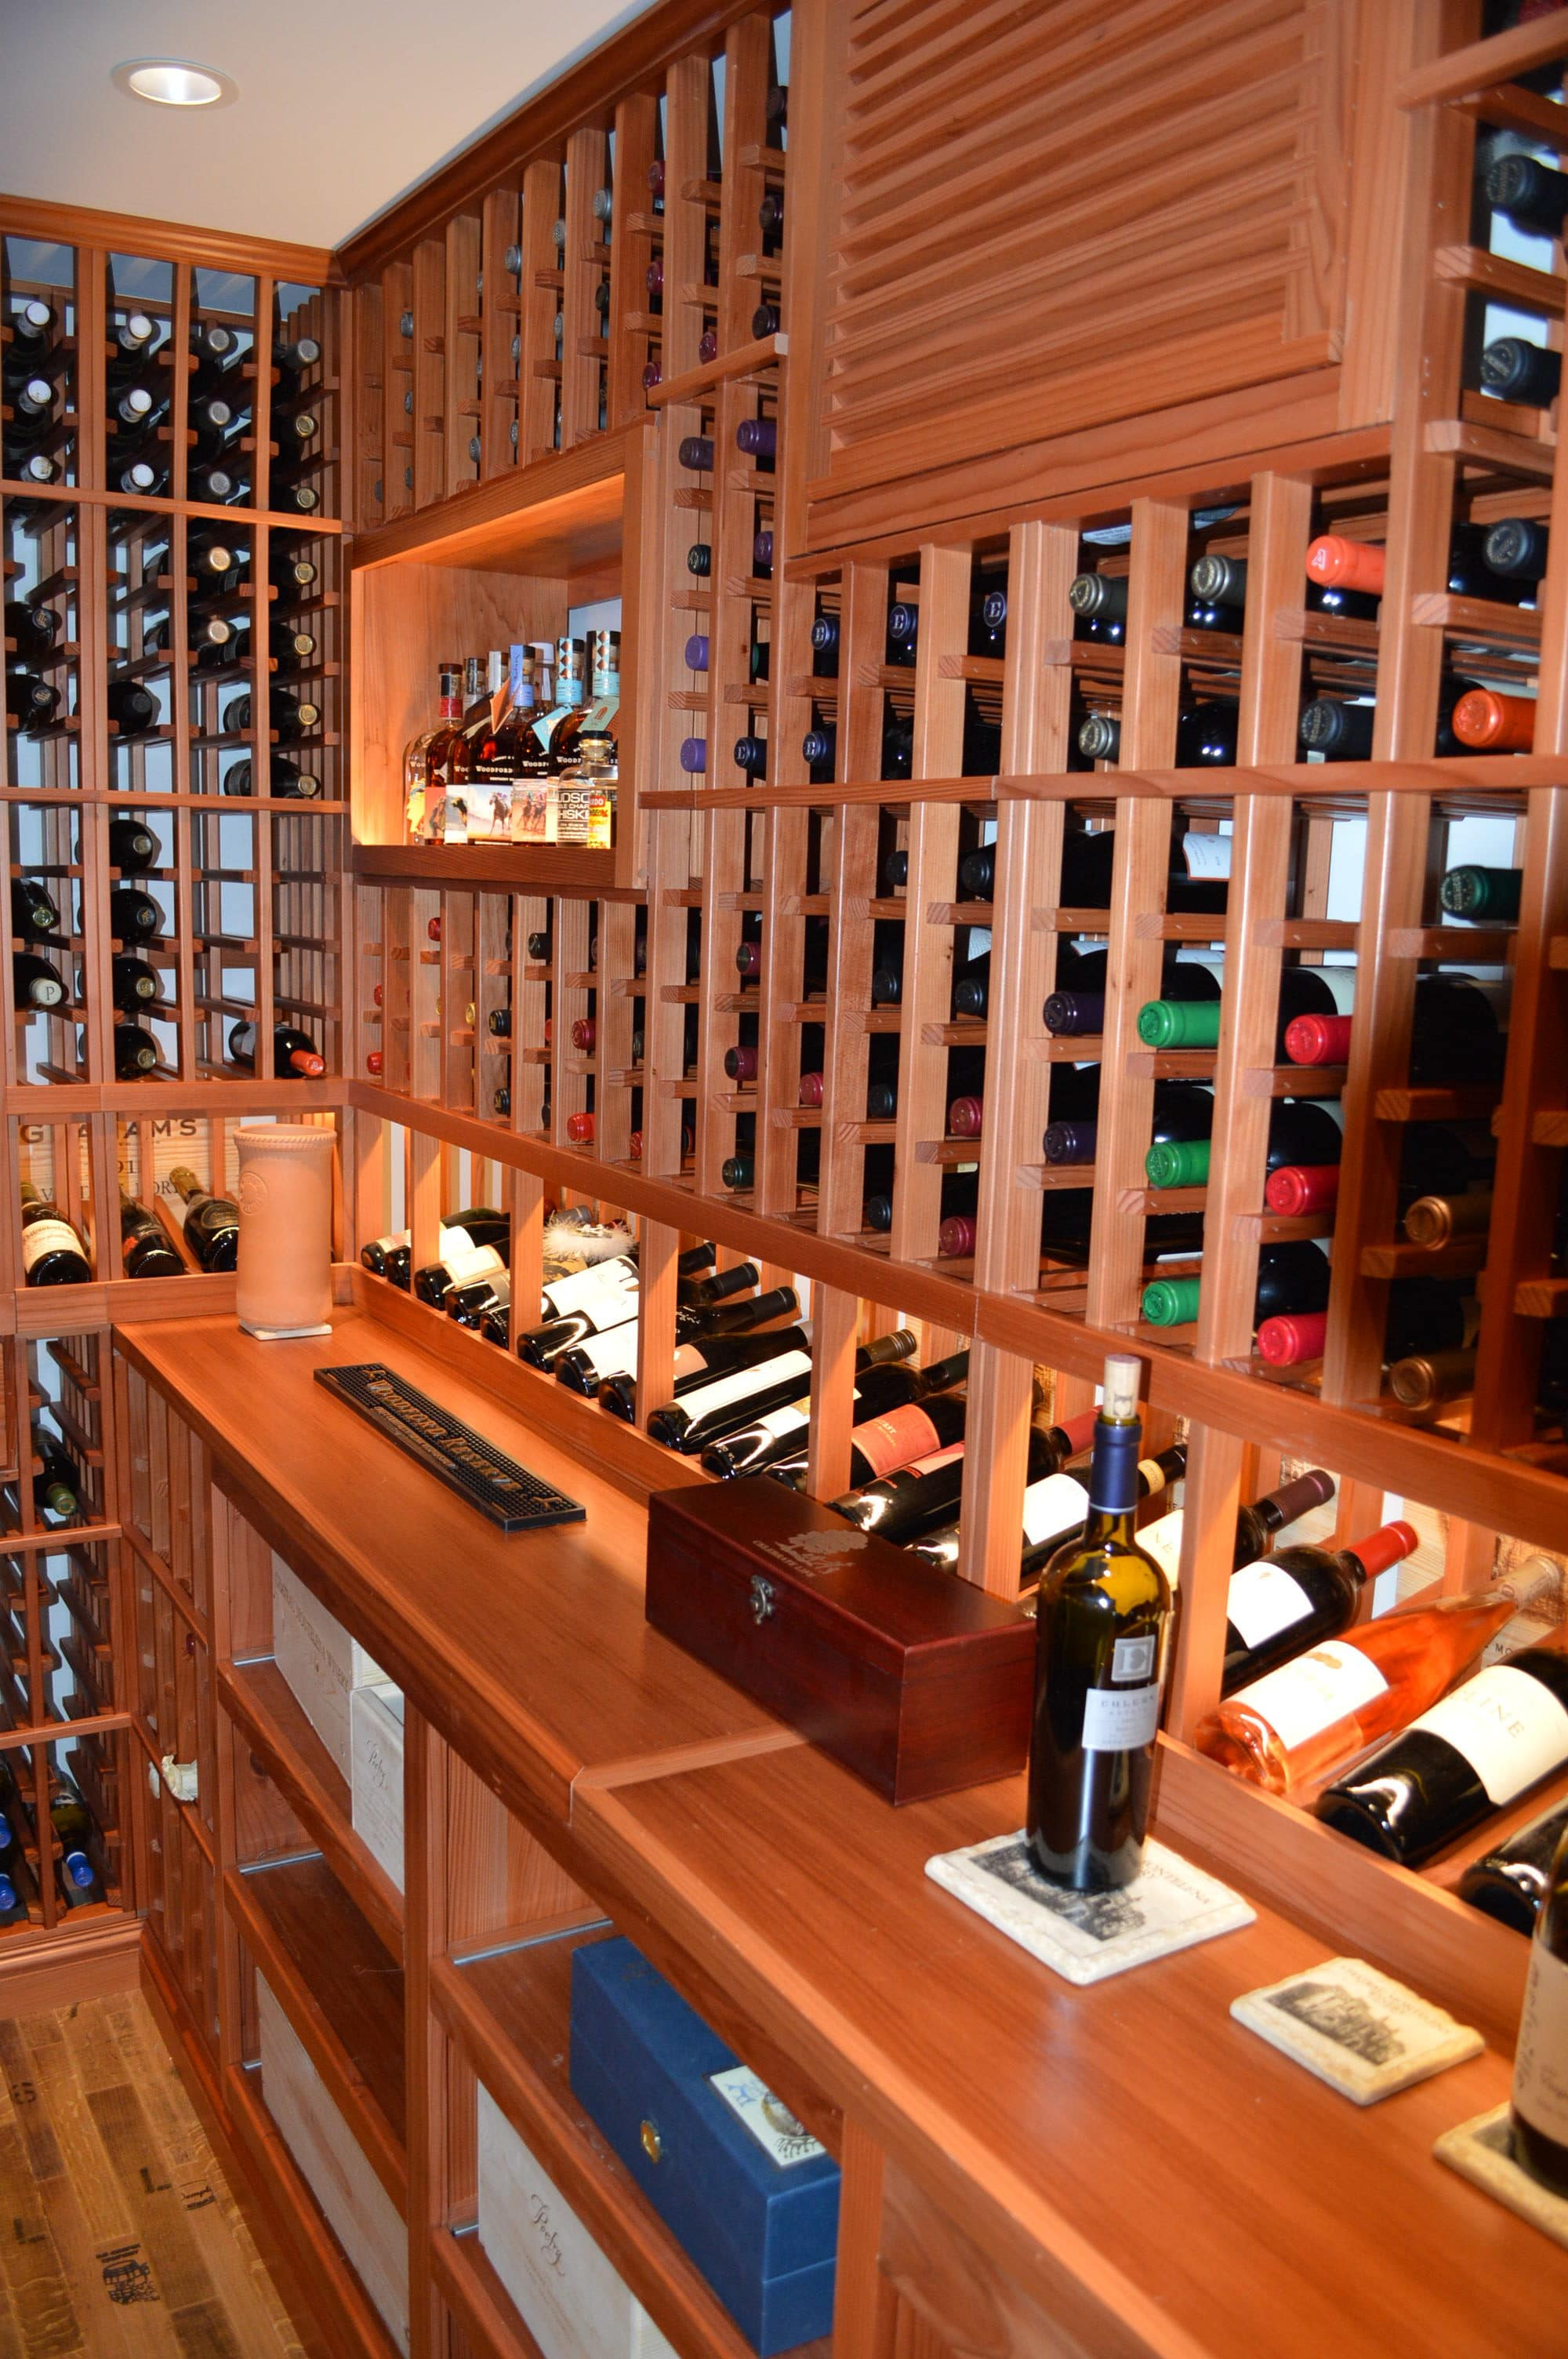 Home Wine Cellar Construction Project In San Francisco - Home wine cellar design